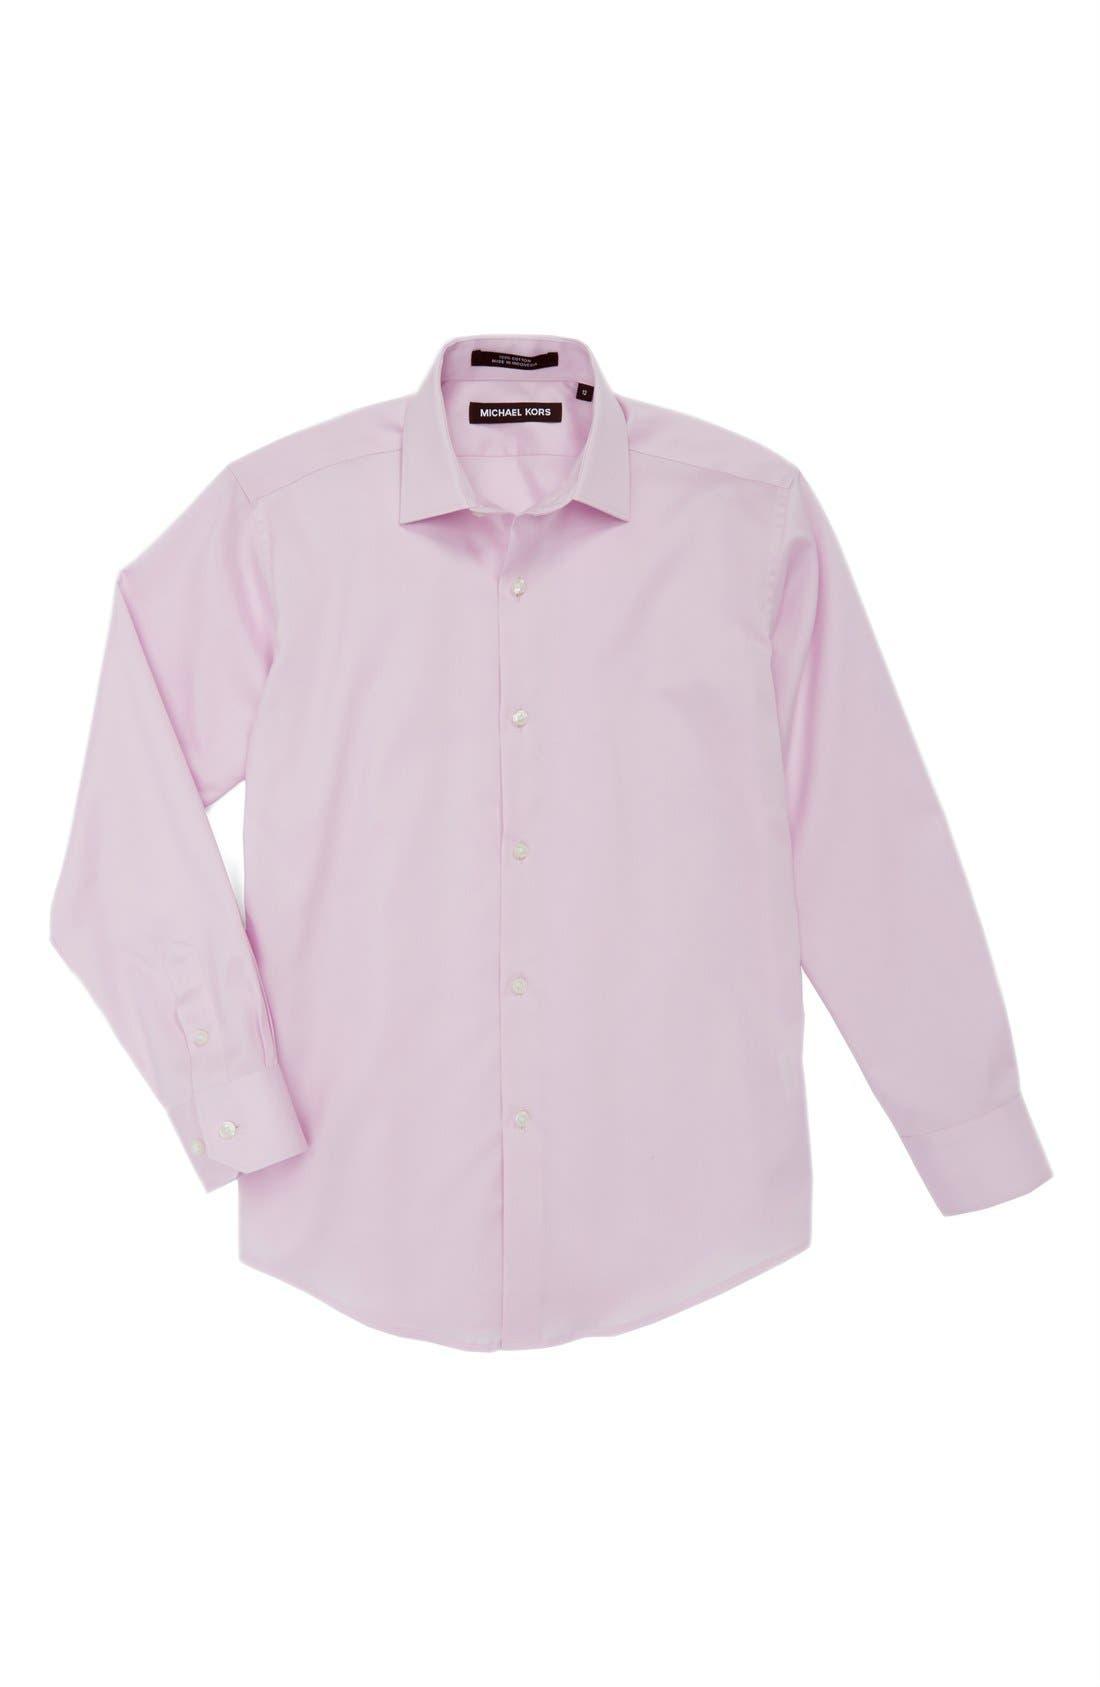 Woven Cotton Dress Shirt,                             Main thumbnail 1, color,                             601